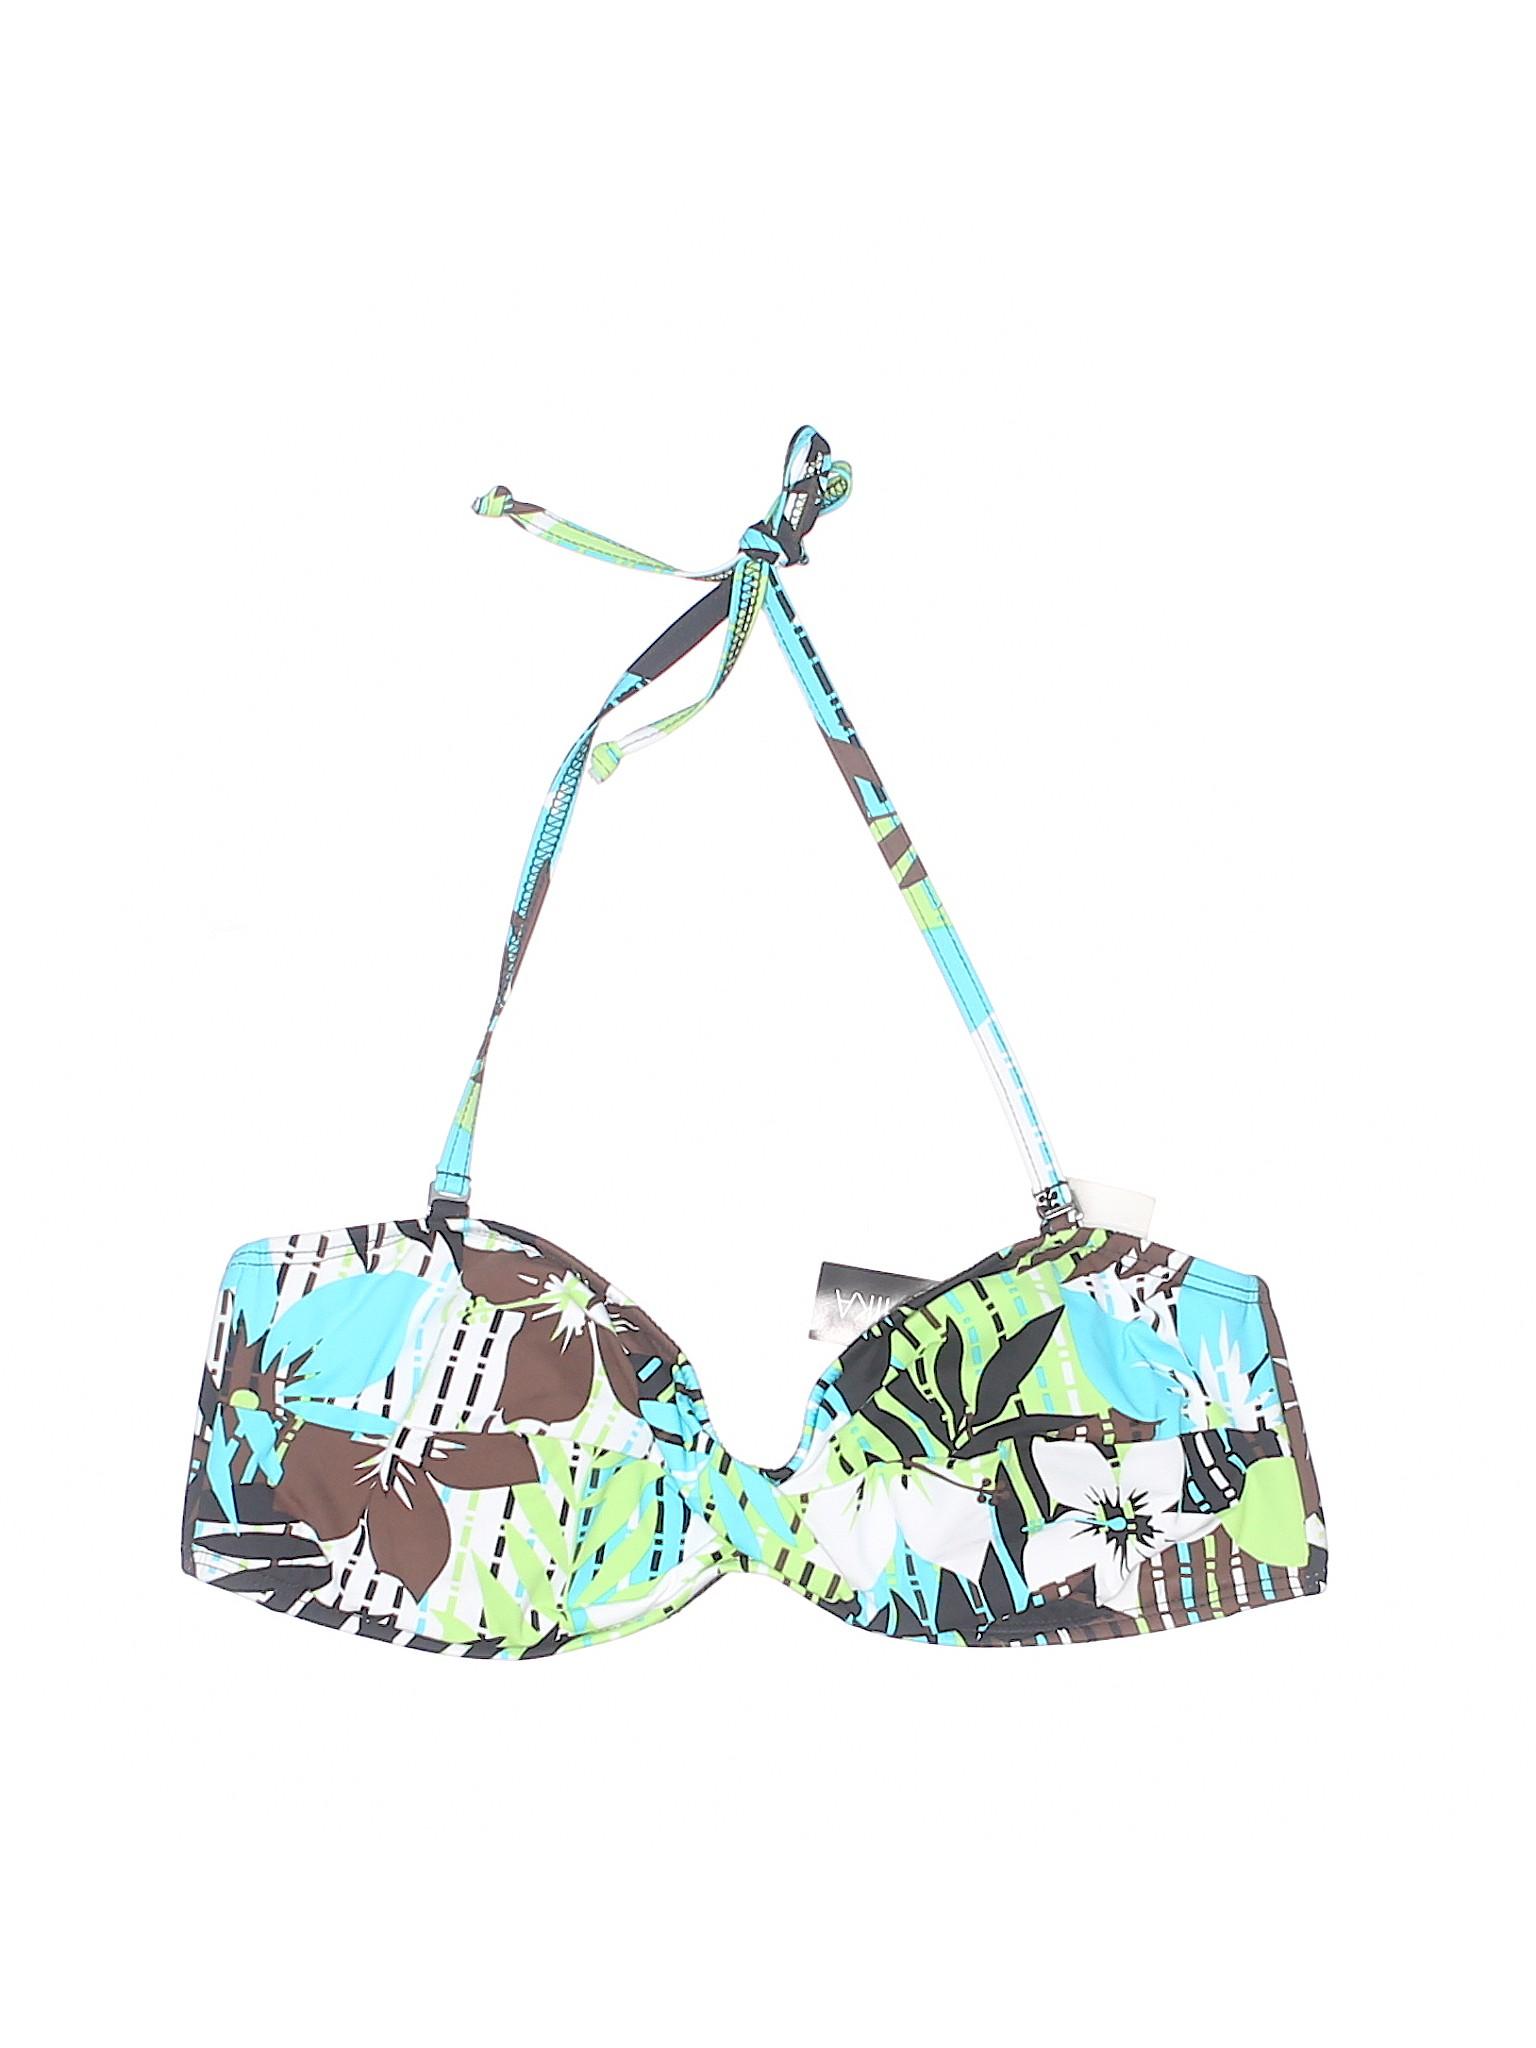 Boutique Swimsuit Kechika Swimsuit Swimsuit Kechika Top Kechika Boutique Boutique Top rx8ArwqB